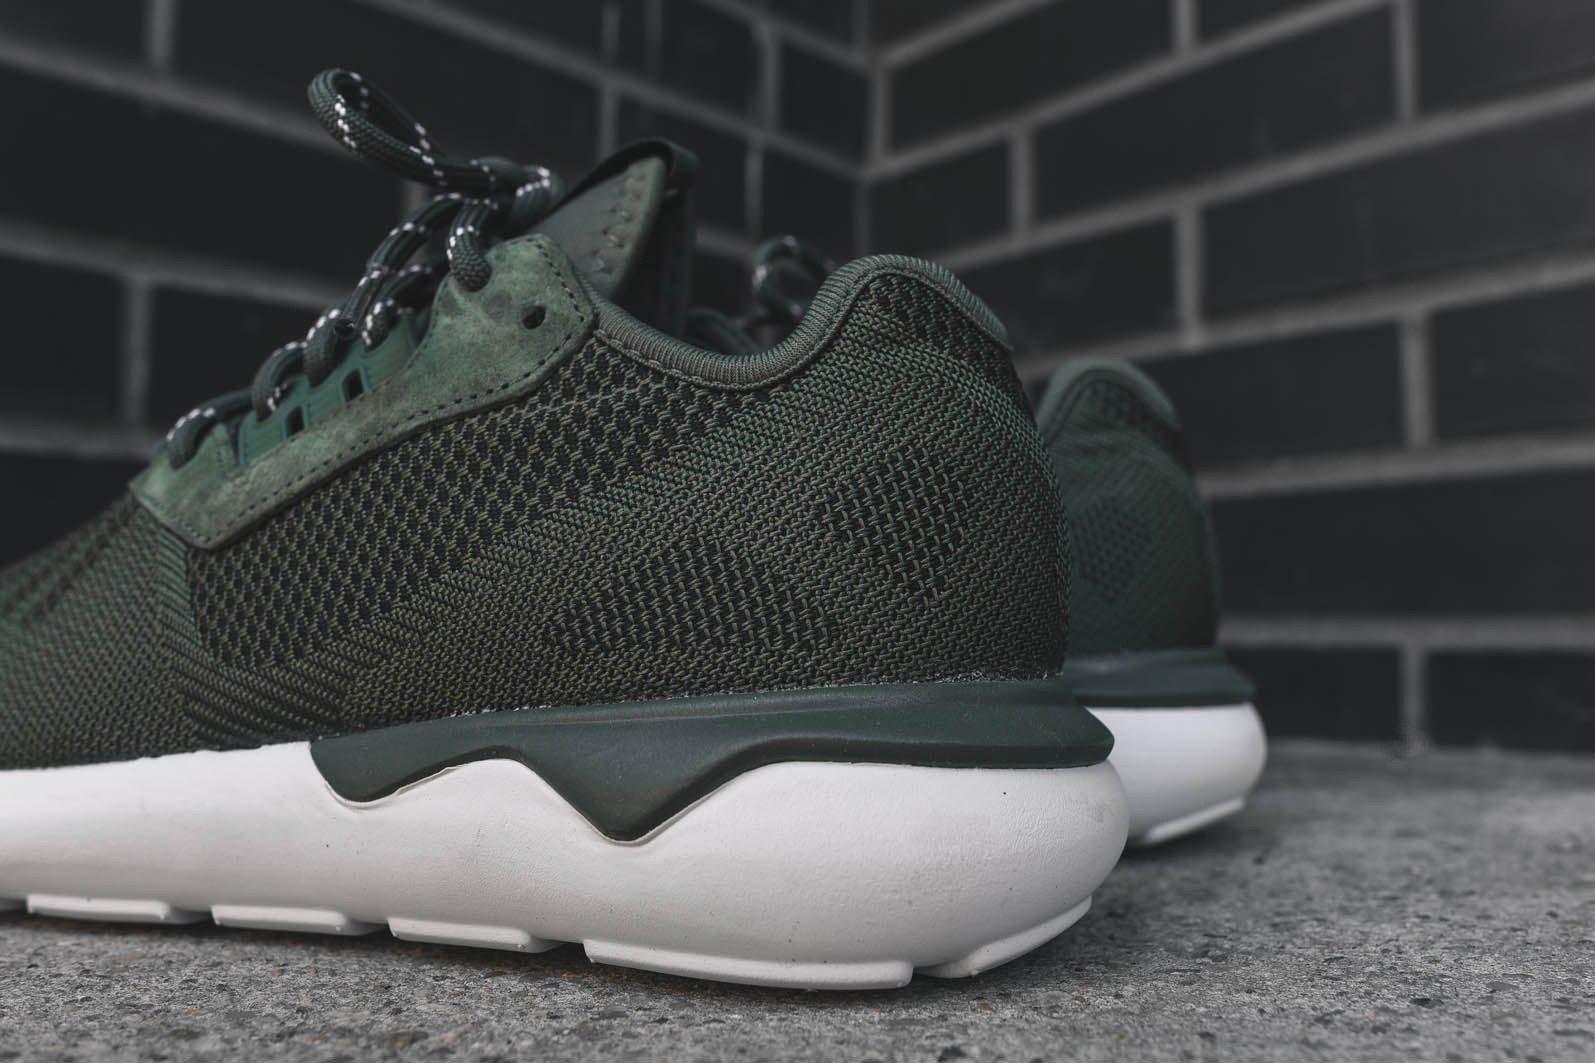 adidas Originals Tubular Runner Weave Base Green 6